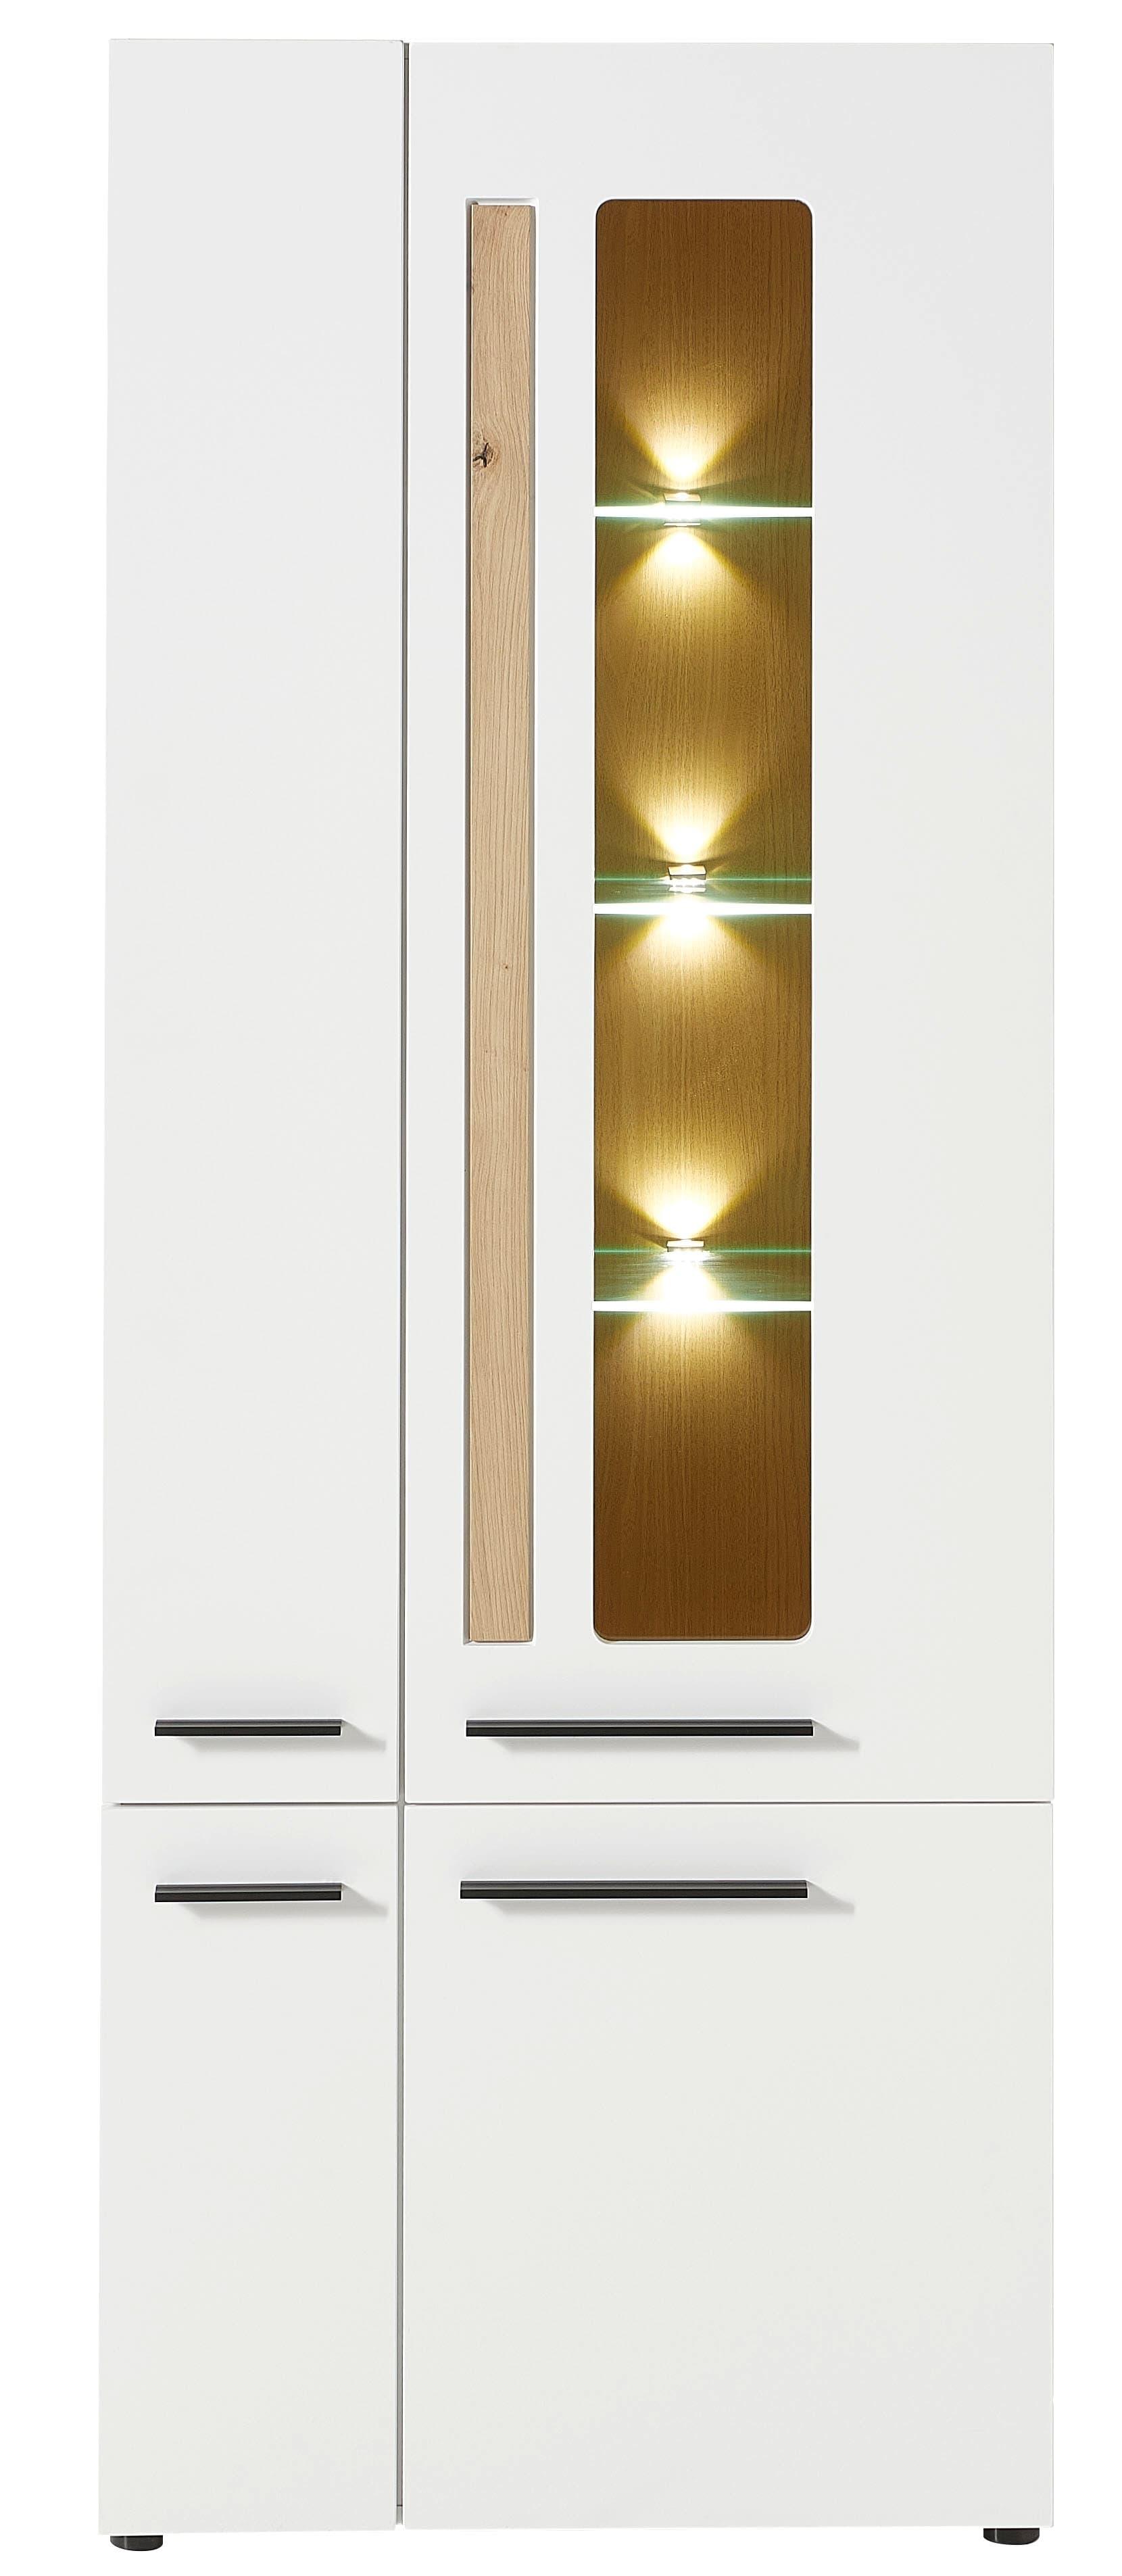 Vitrina din MDF, cu 4 usi si LED inclus Loftis Alb / Stejar, l76xA37xH201 cm imagine